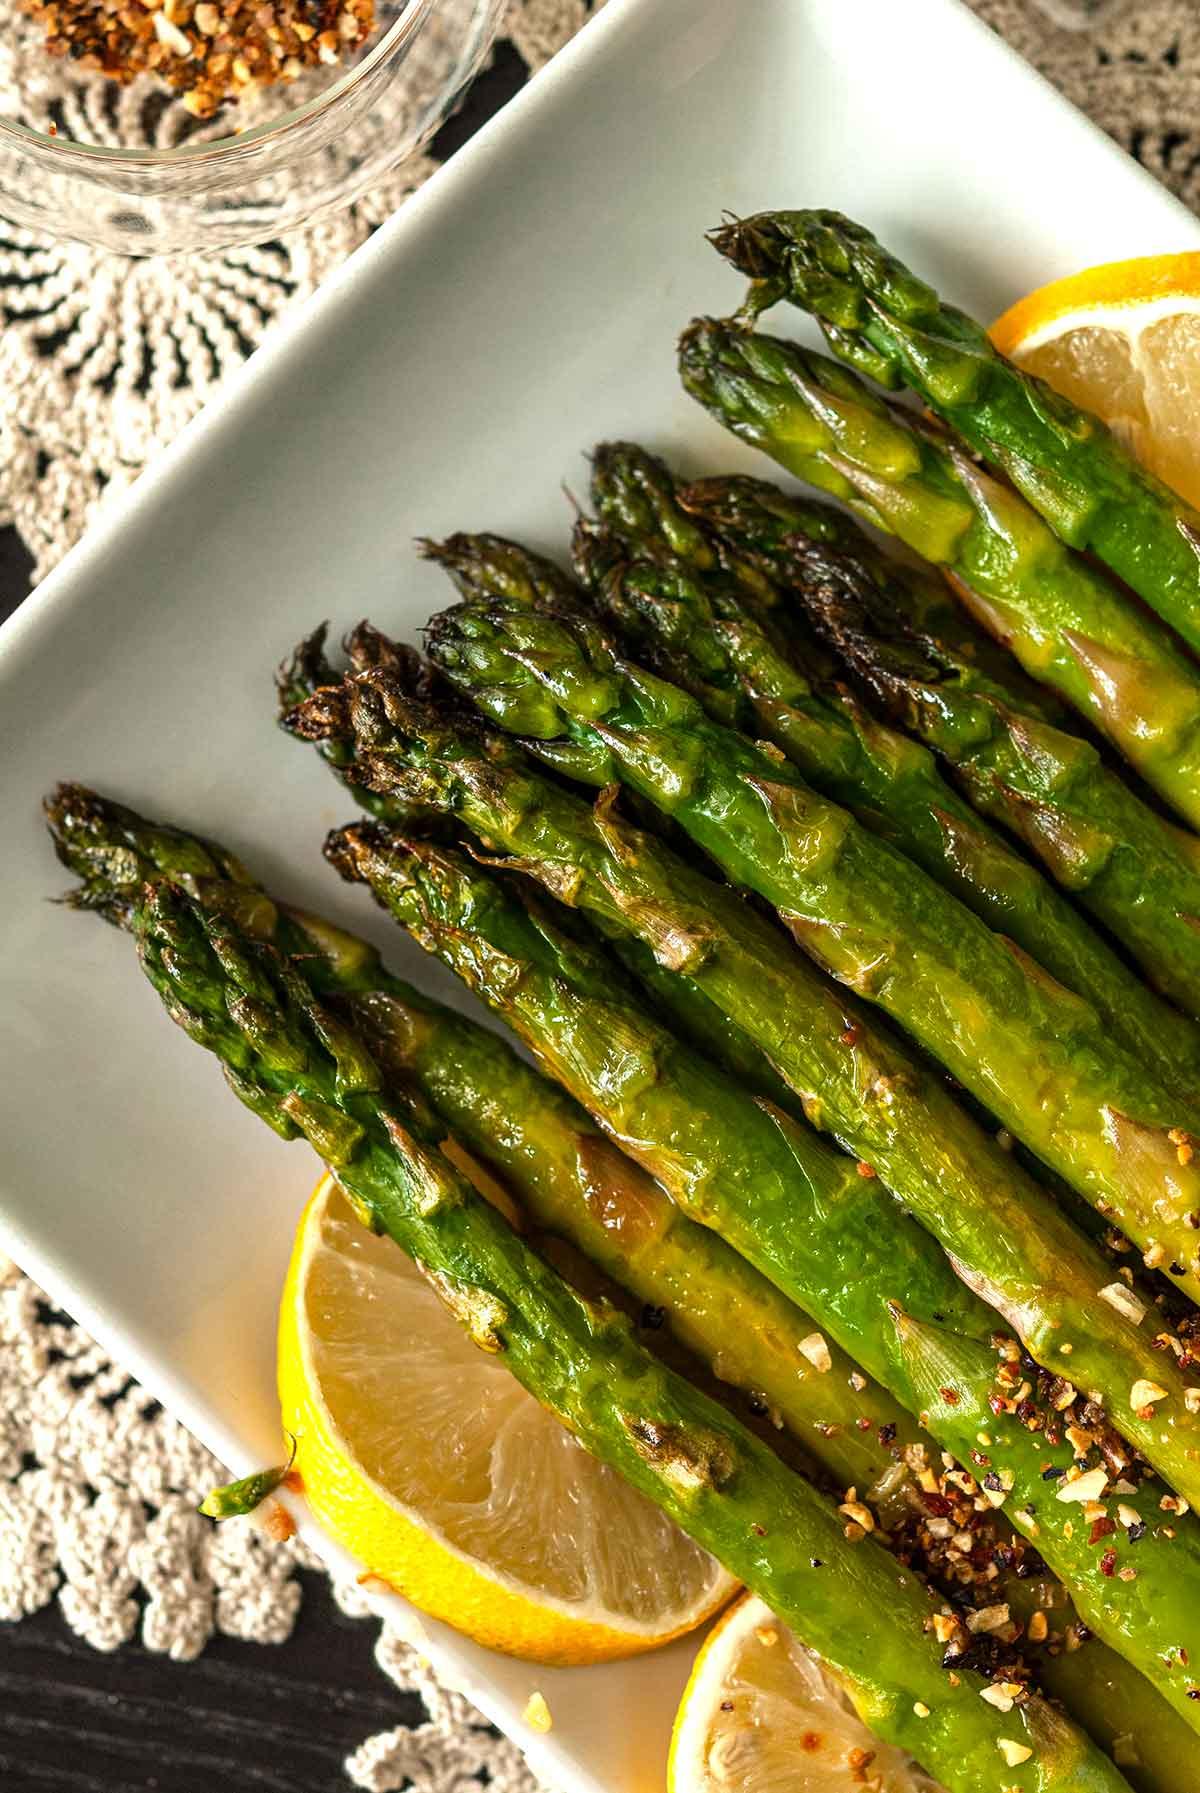 Crispy asparagus tips on a plate, garnished with lemons.